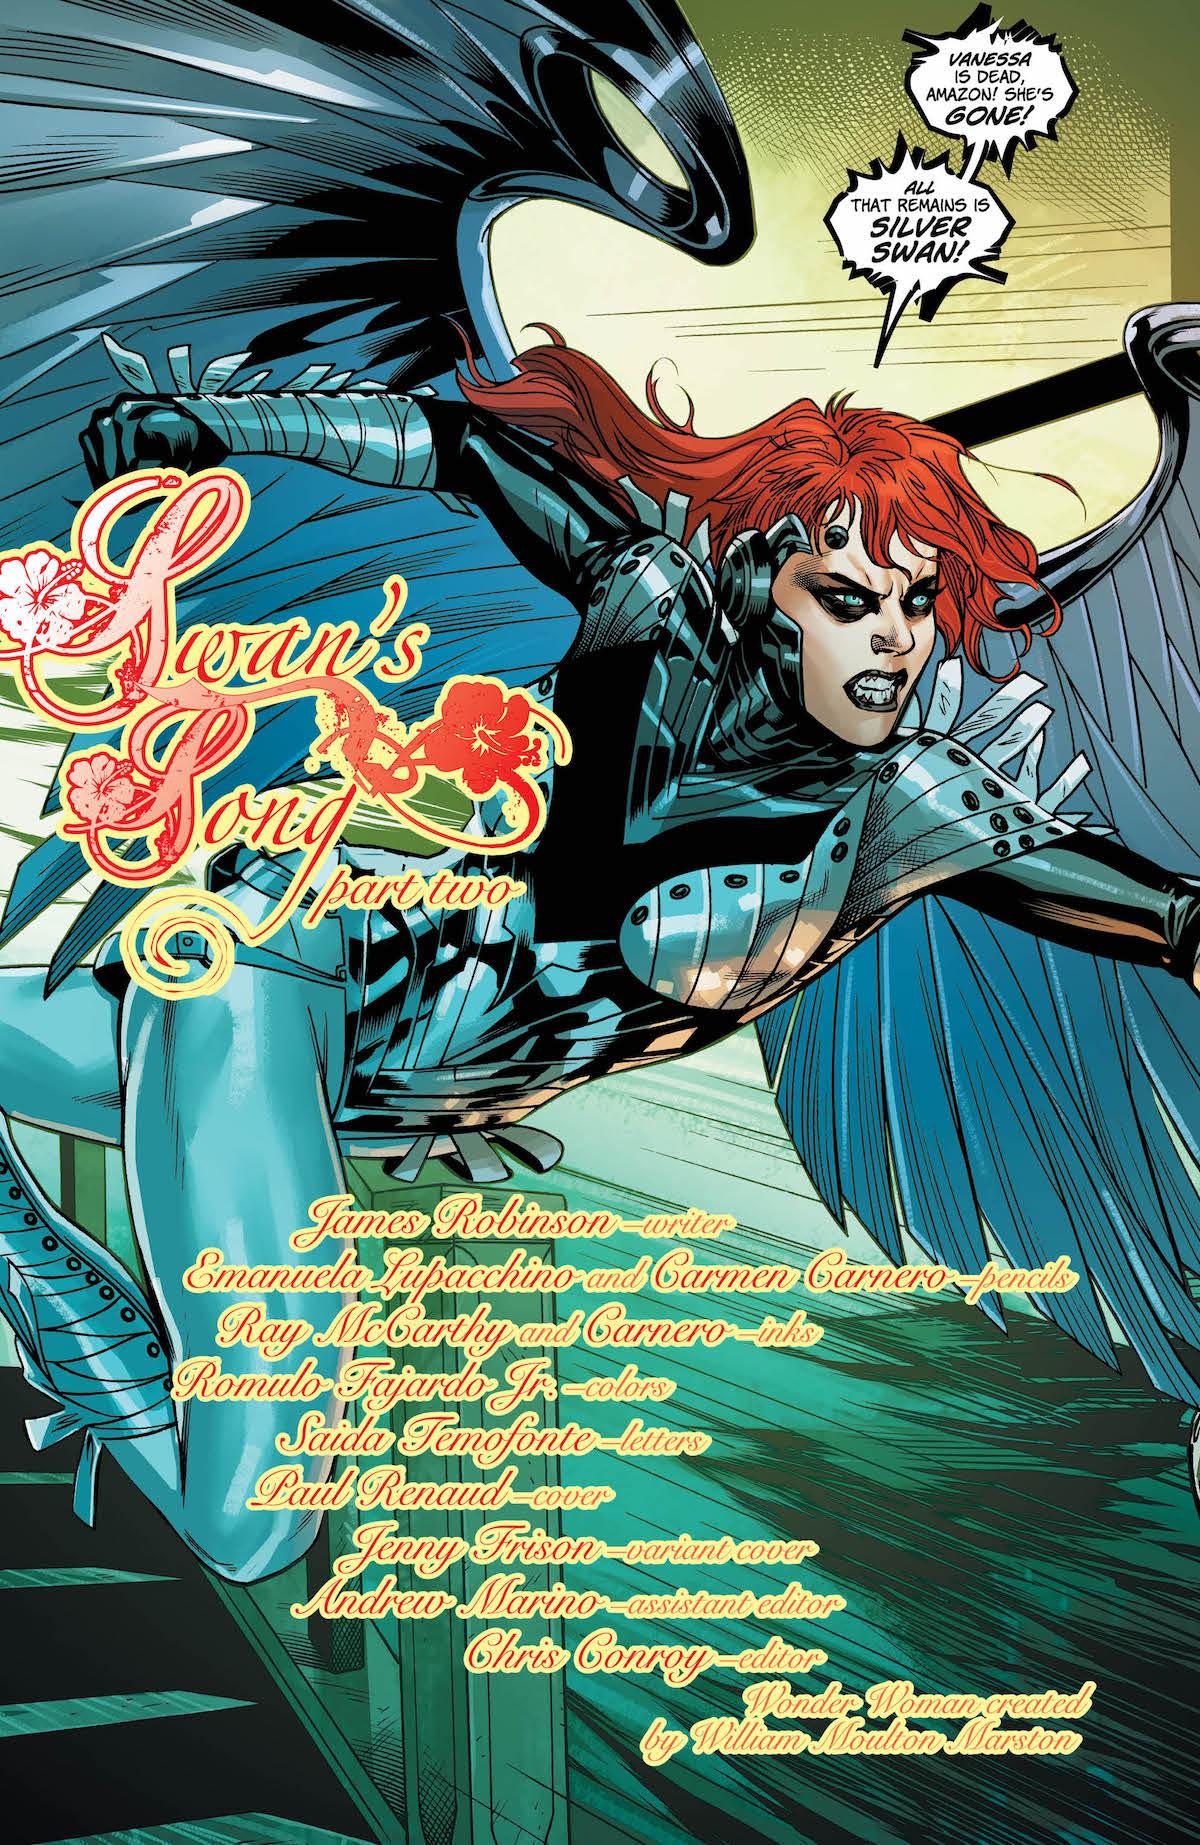 Wonder Woman #39 page 2